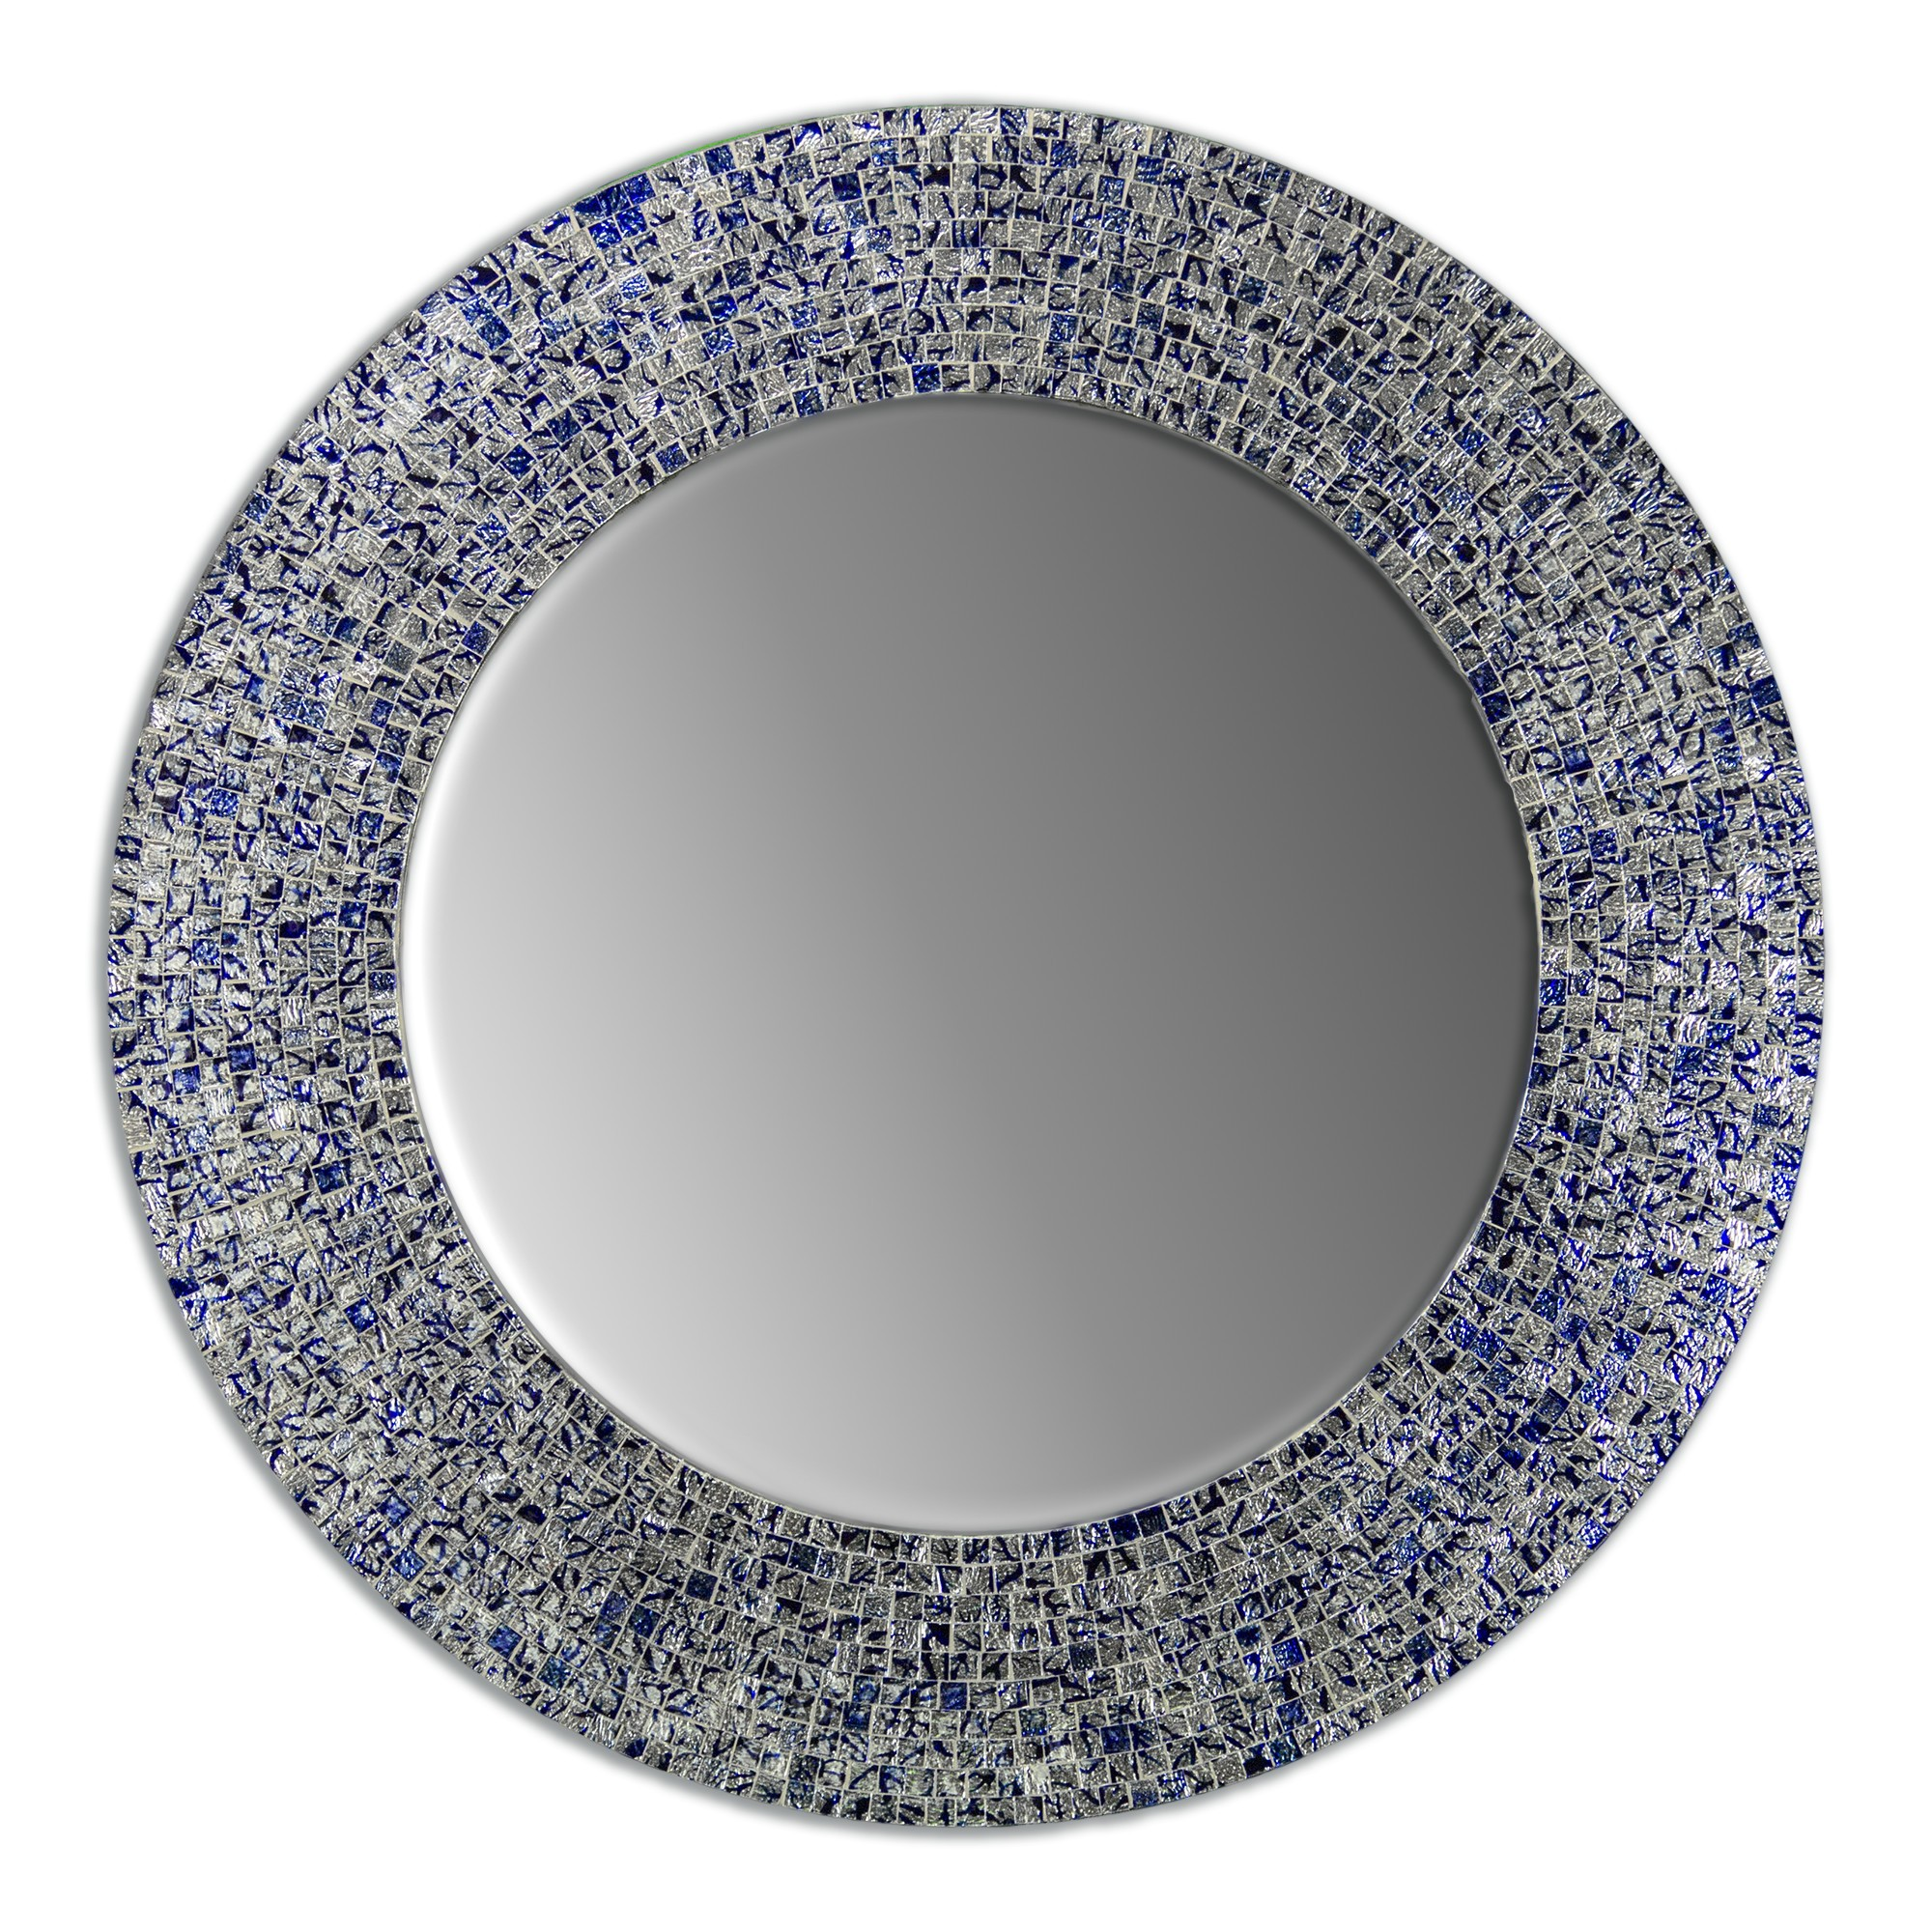 24 Sapphire And Silver Handmade Decorative Glass Mosaic Wall Mirror Decors